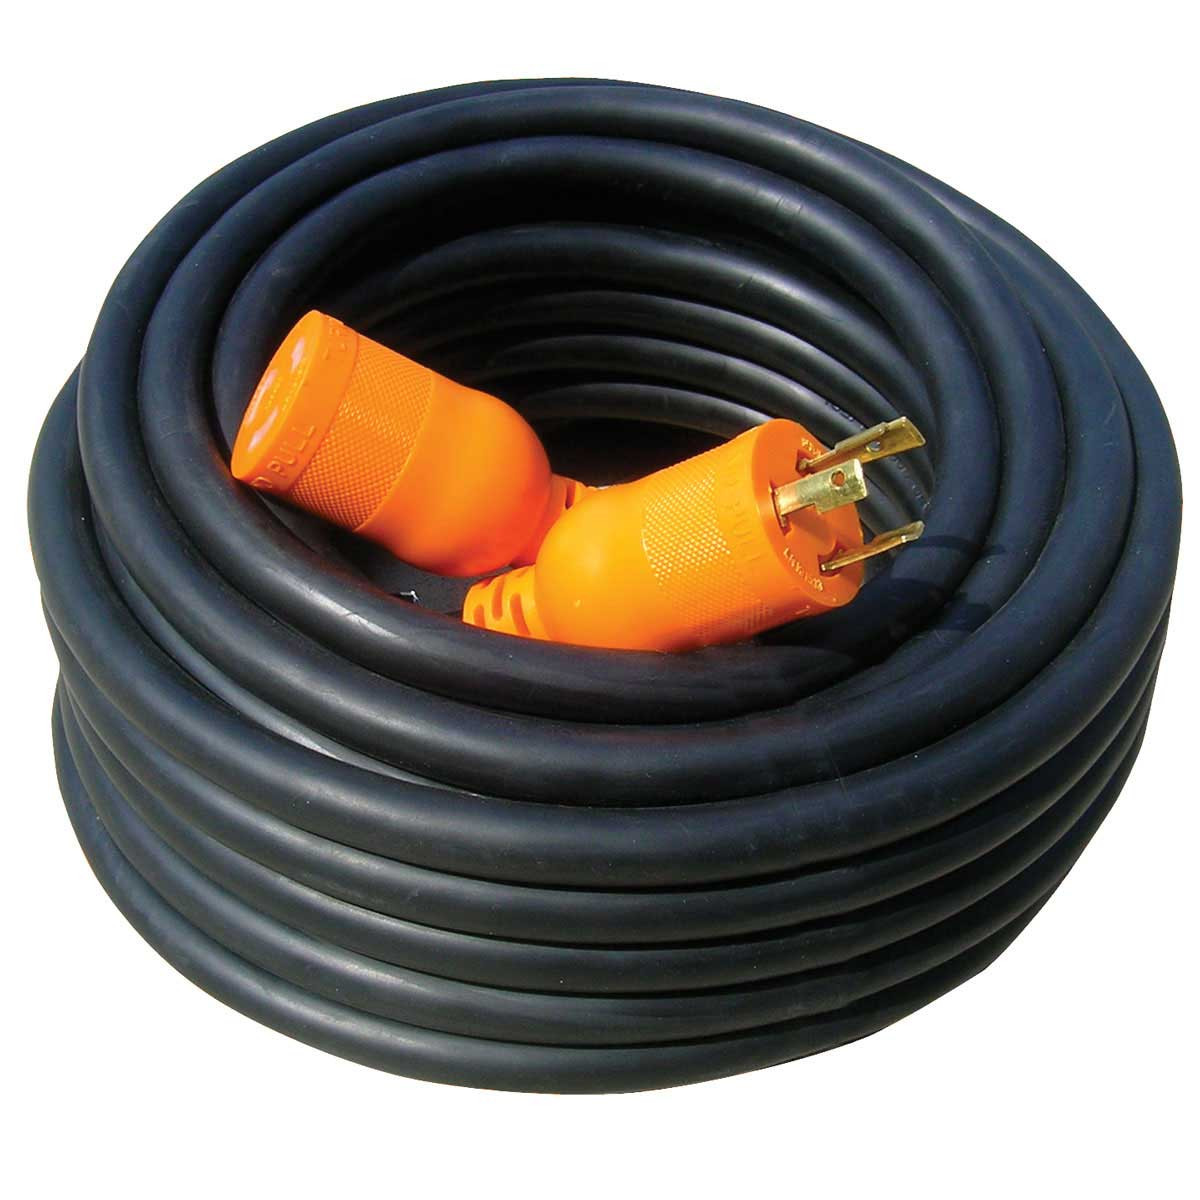 voltec all-flex locking black 100ft extension cord